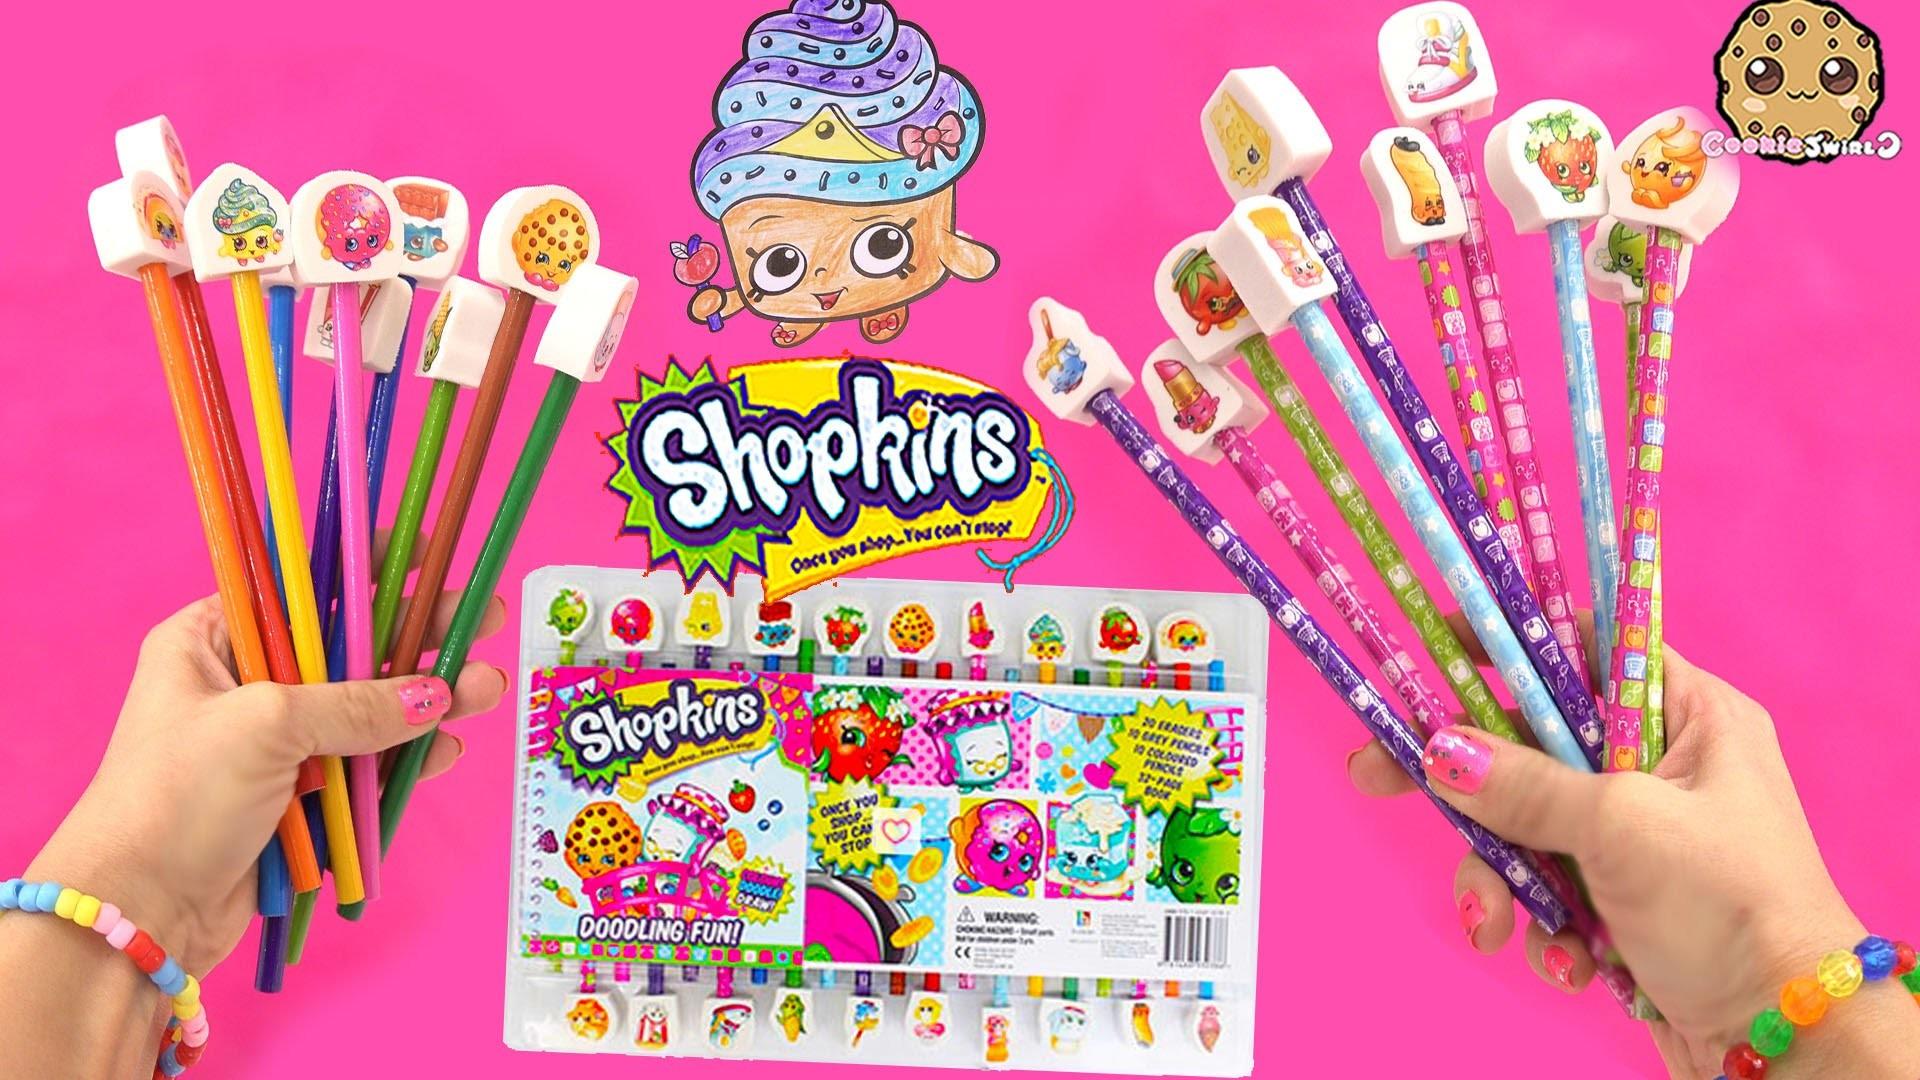 Shopkins Doodling Fun Art Color Book Coloring Pencils Erasers Set Unboxing  Video Cookieswirlc Youtube. make …